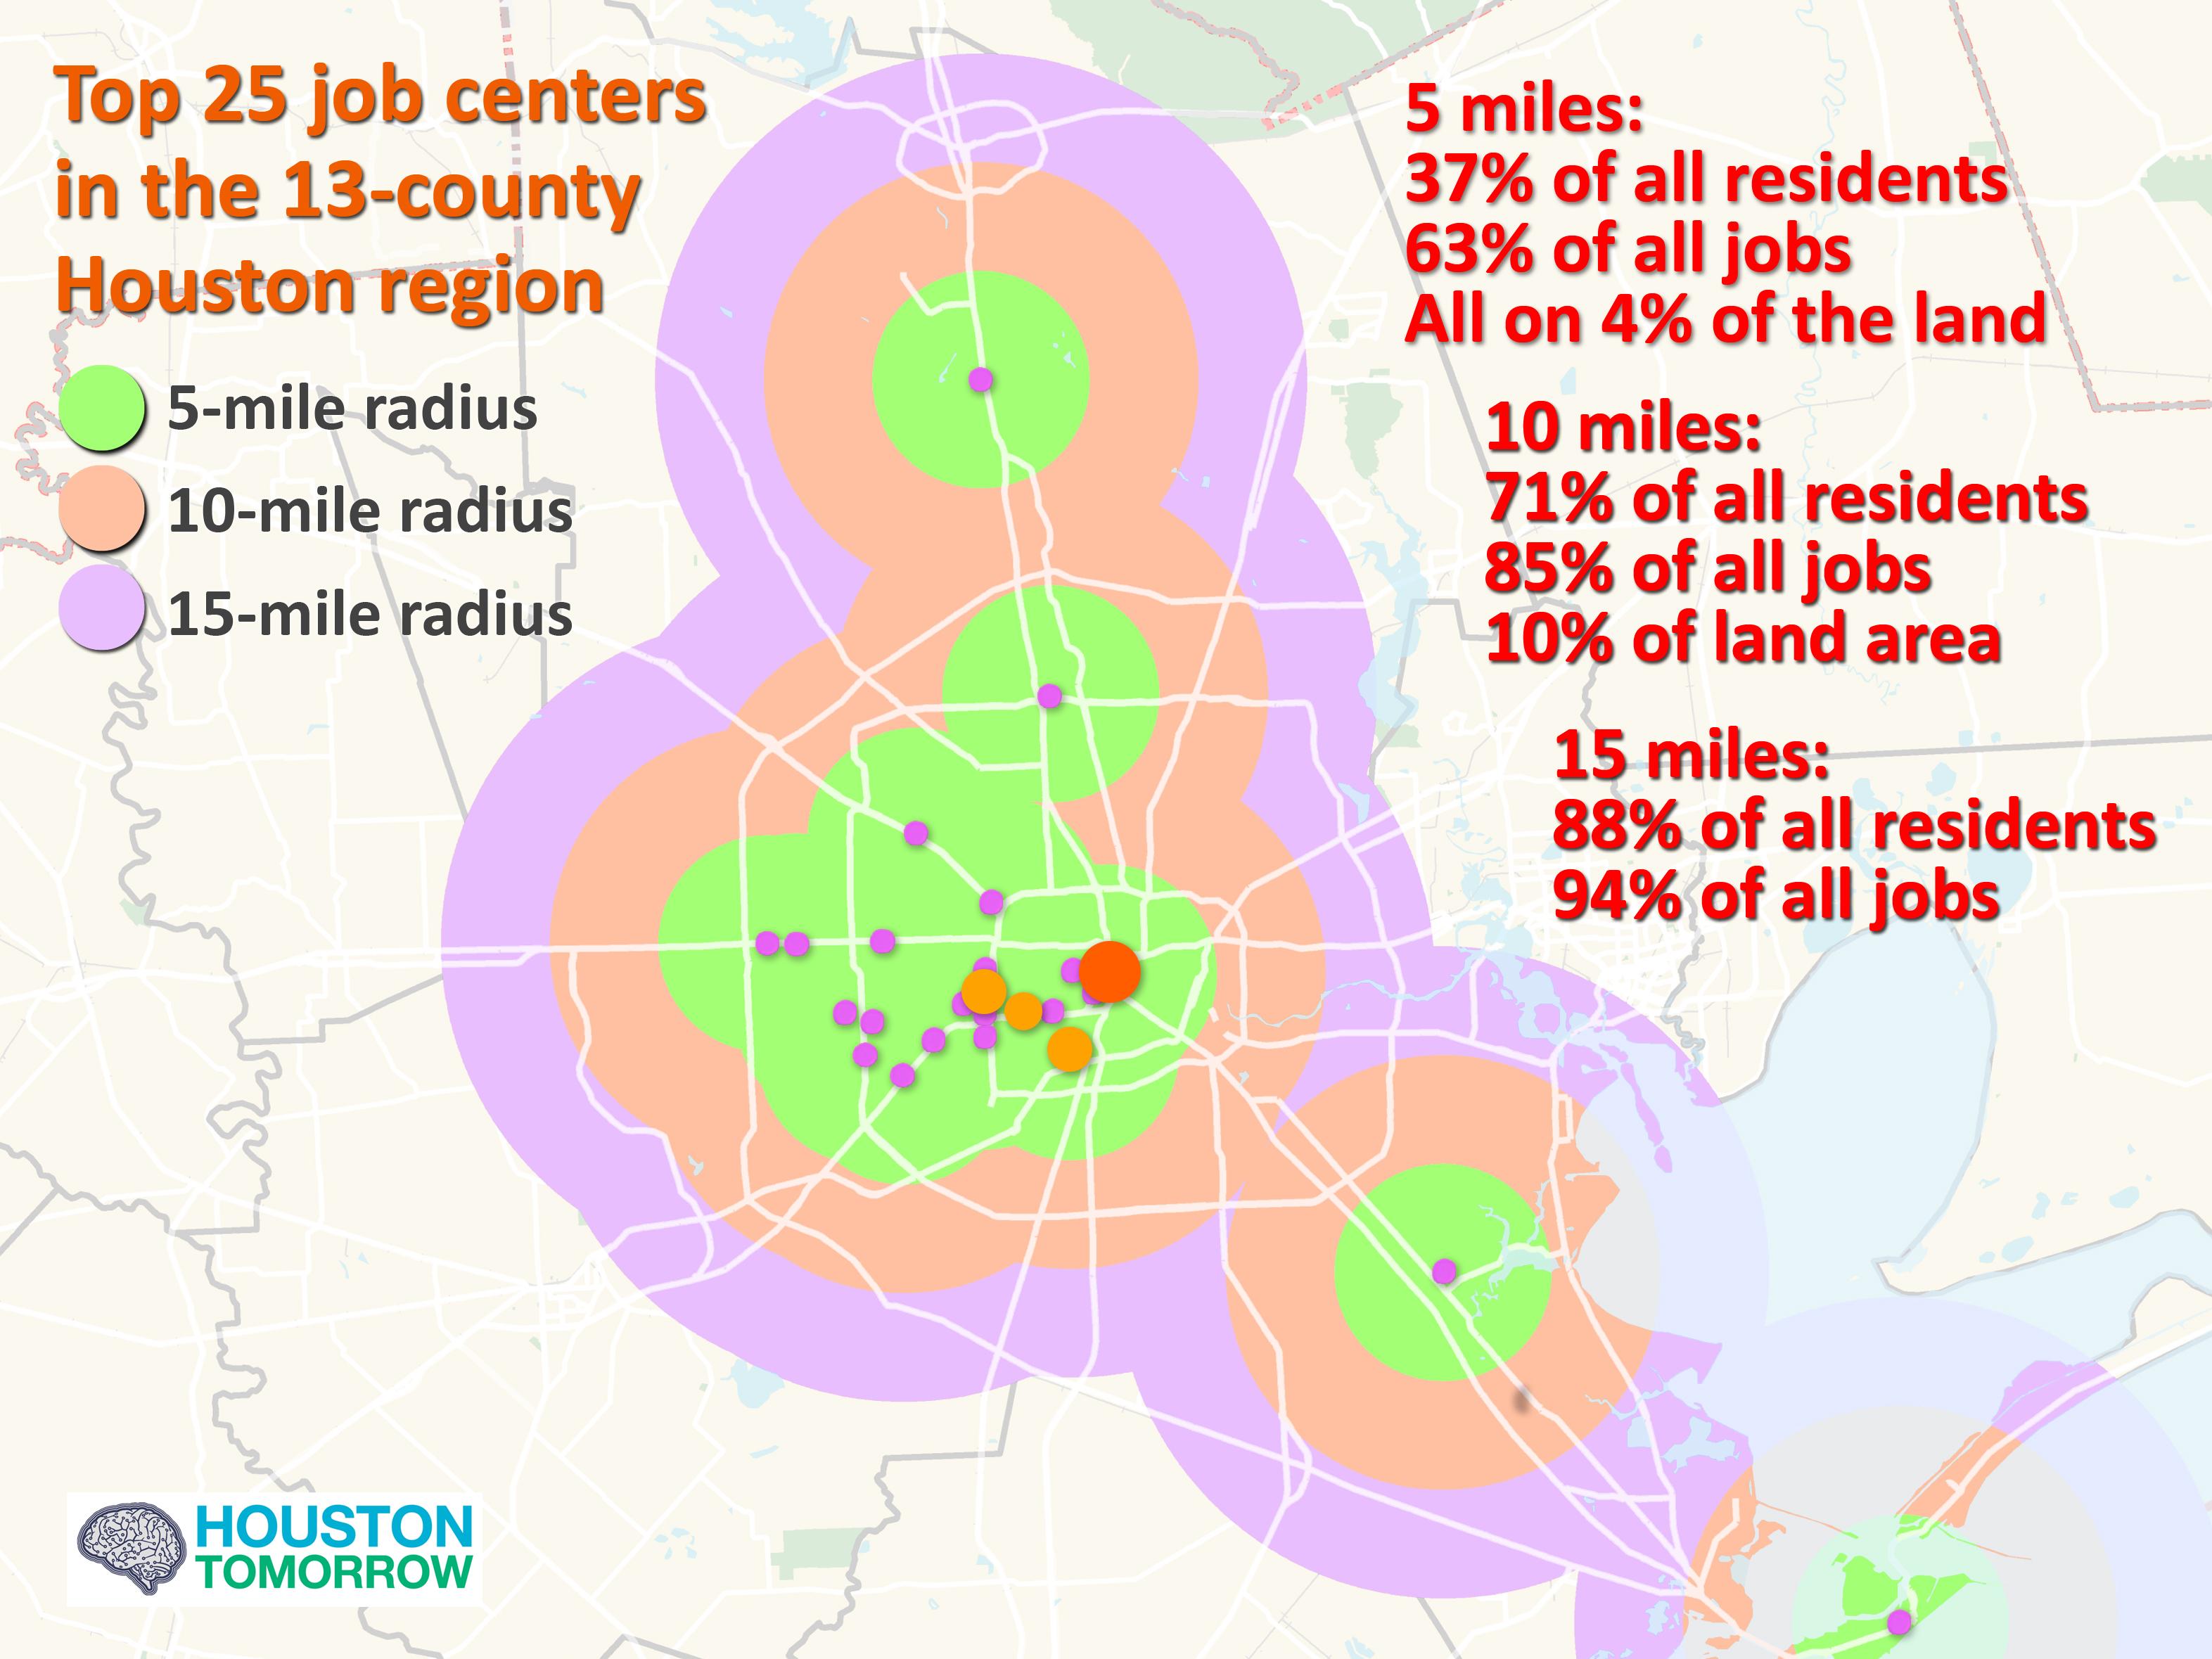 top 25 job centers